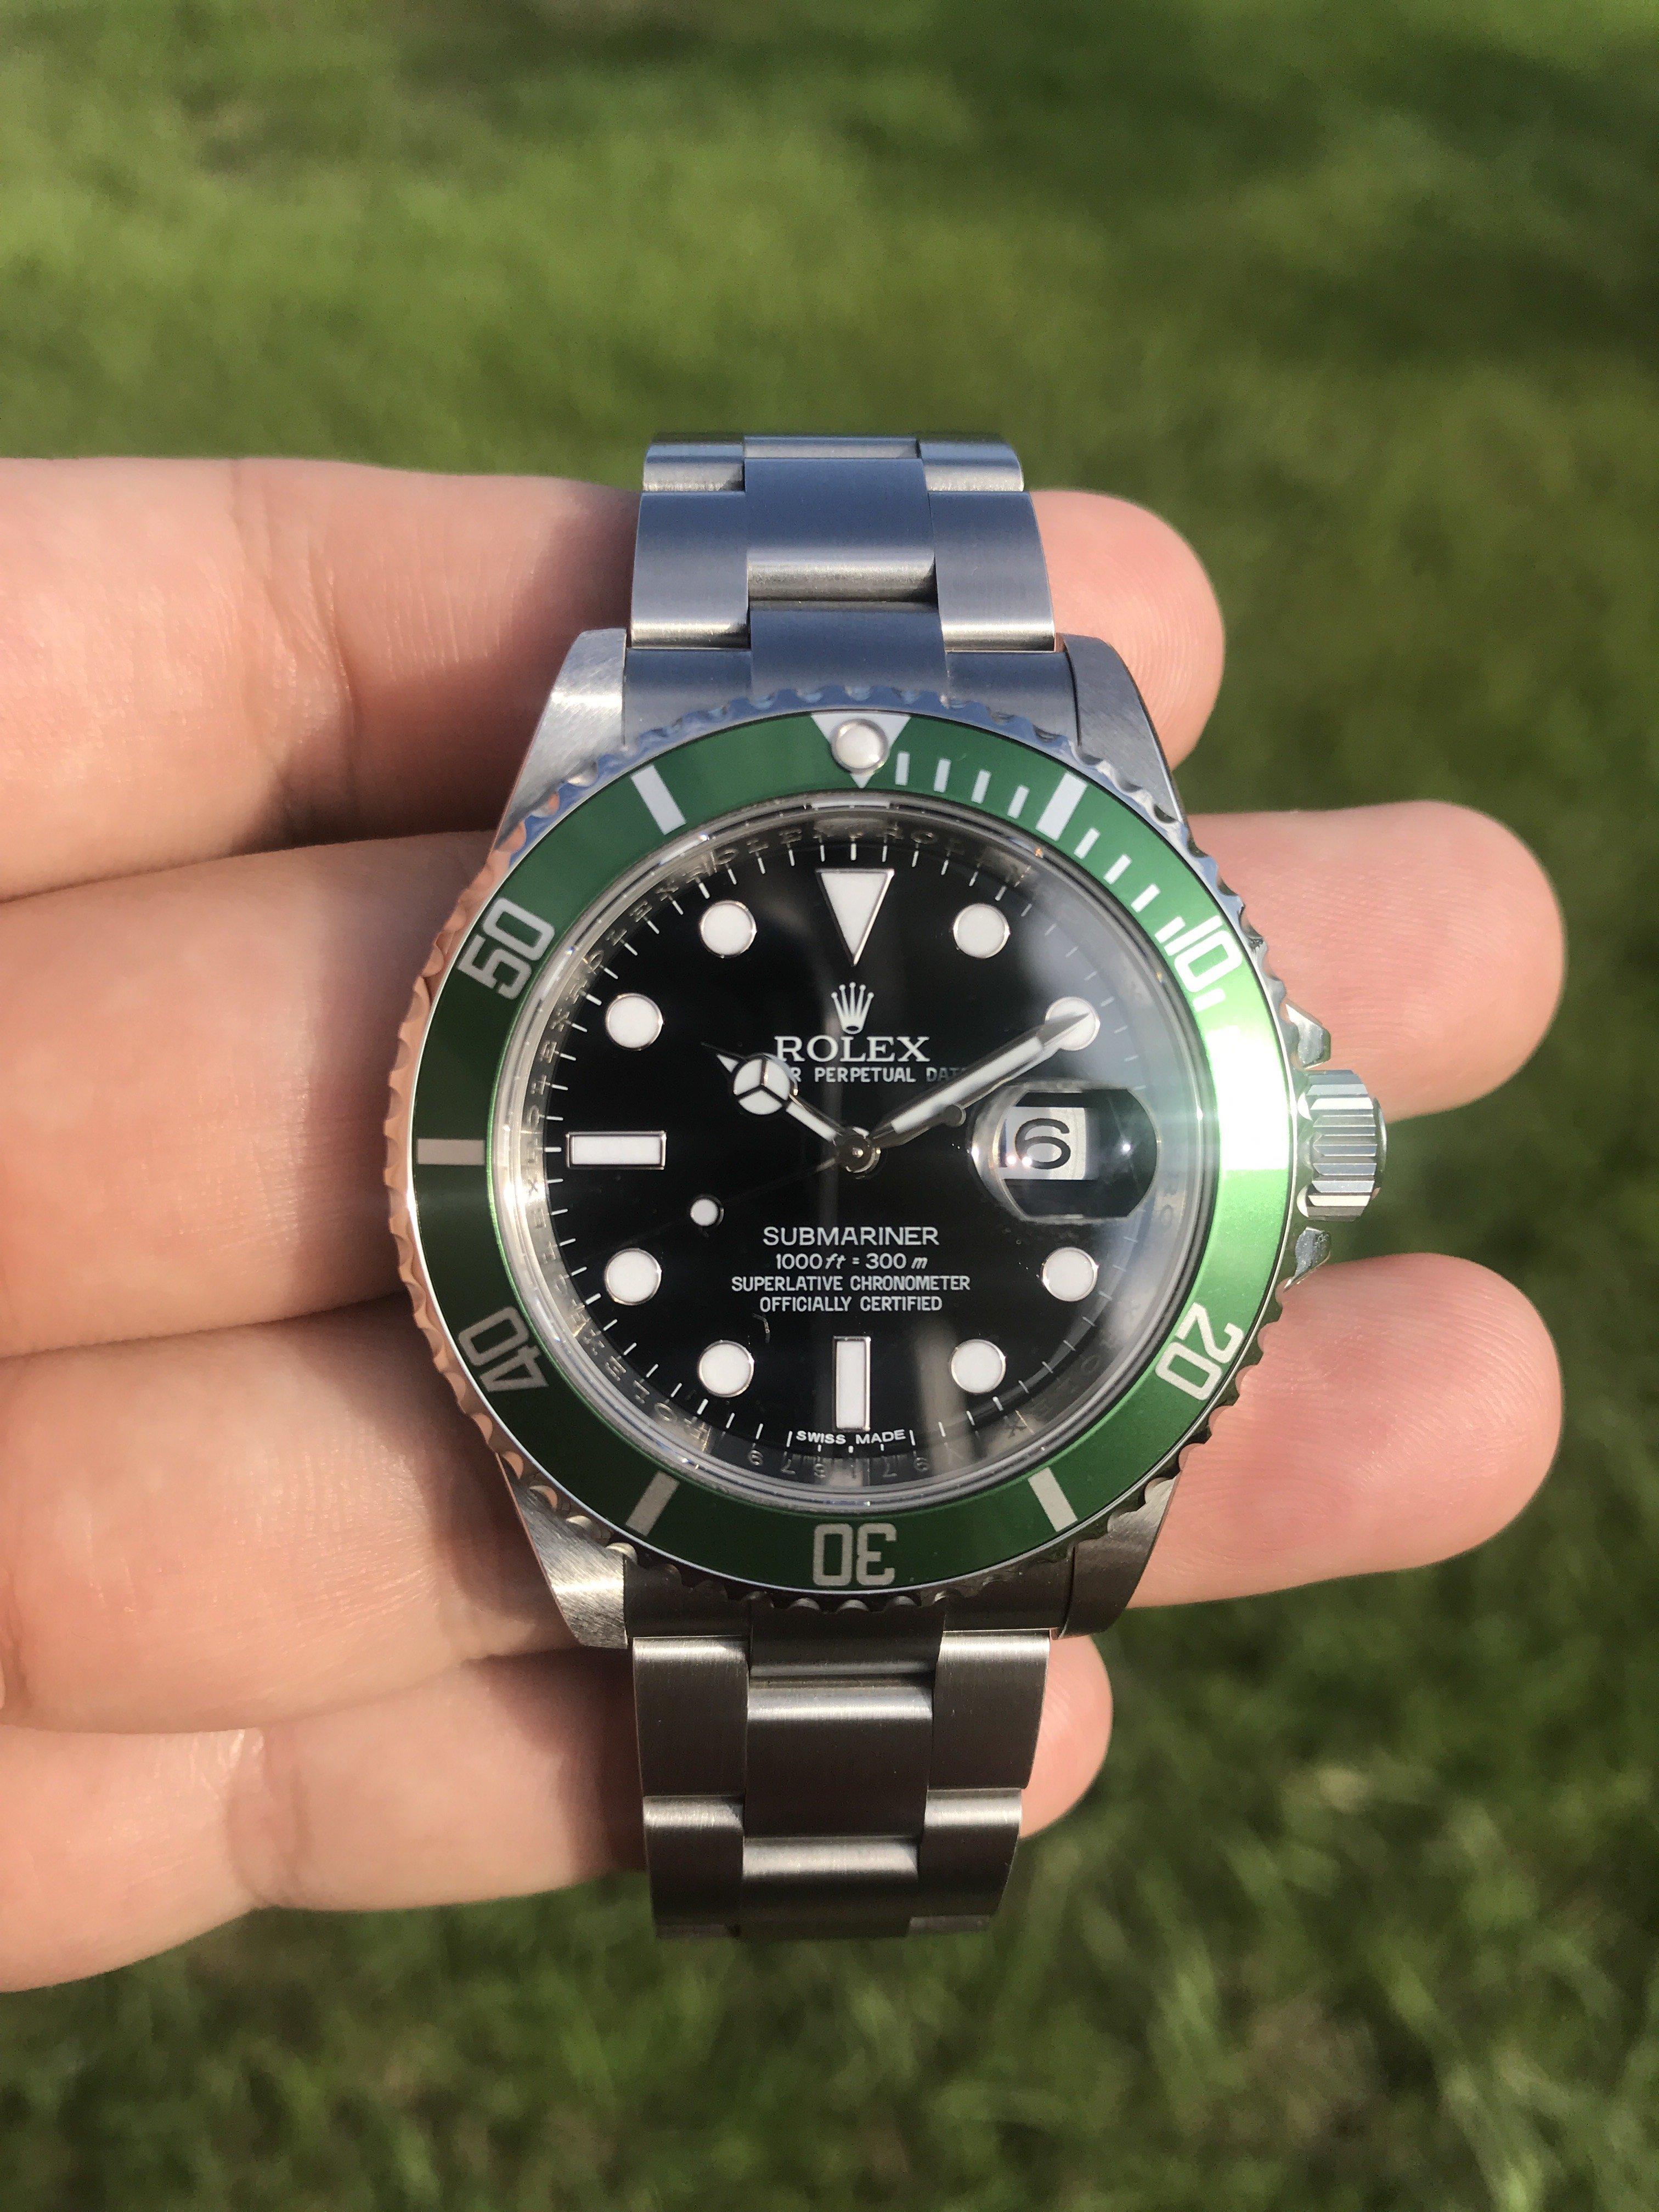 D✚L 正品手錶 ROLEX 16610LV 綠水鬼 AD貨 舊綠水鬼 非 126610lv 116610lv 平頭4